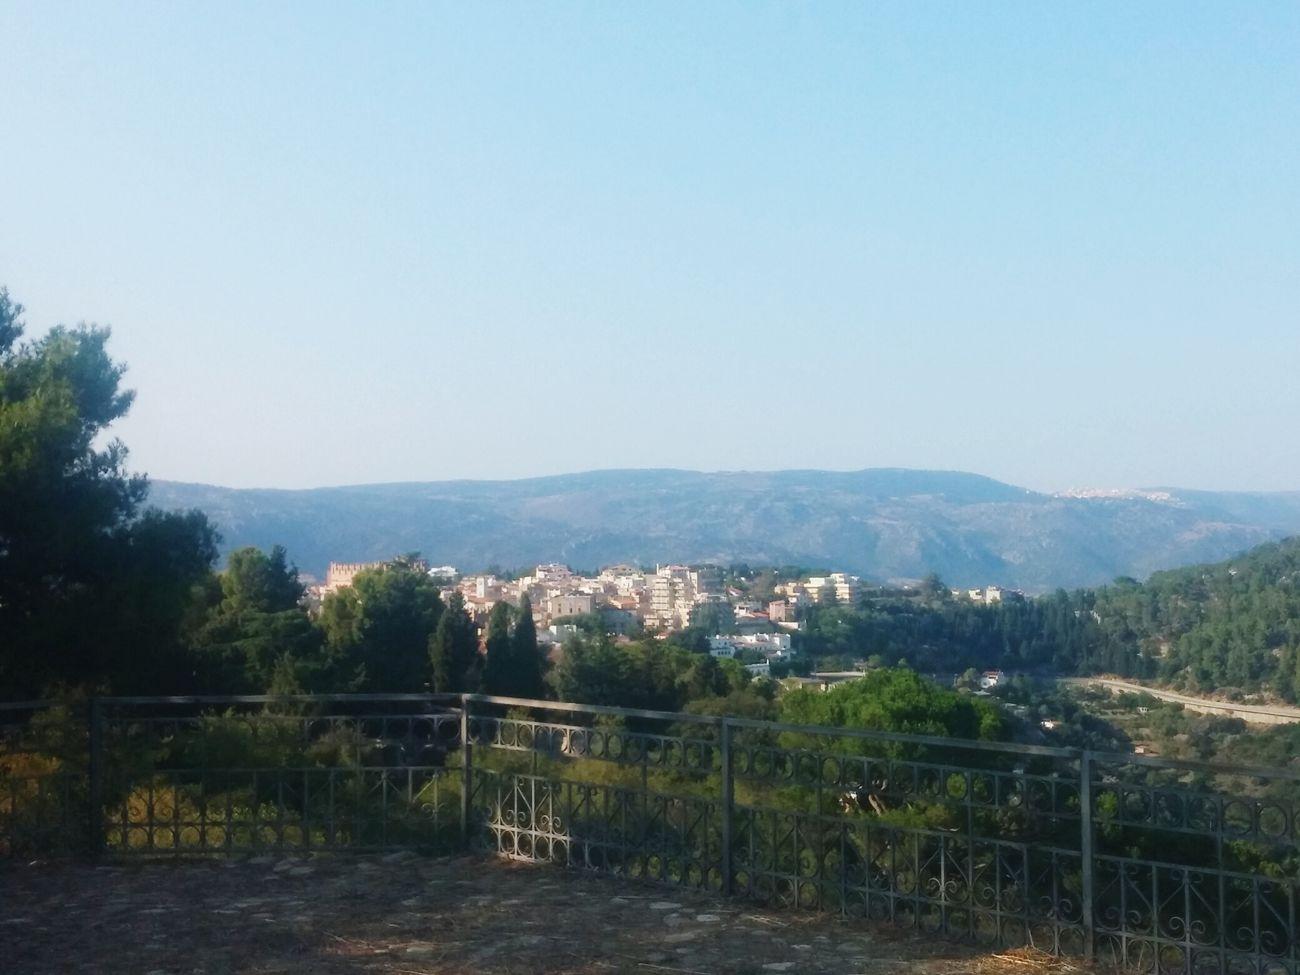 Giornatealternative Sardegna Nuoro La Pace Dei Sensi La Solitudine